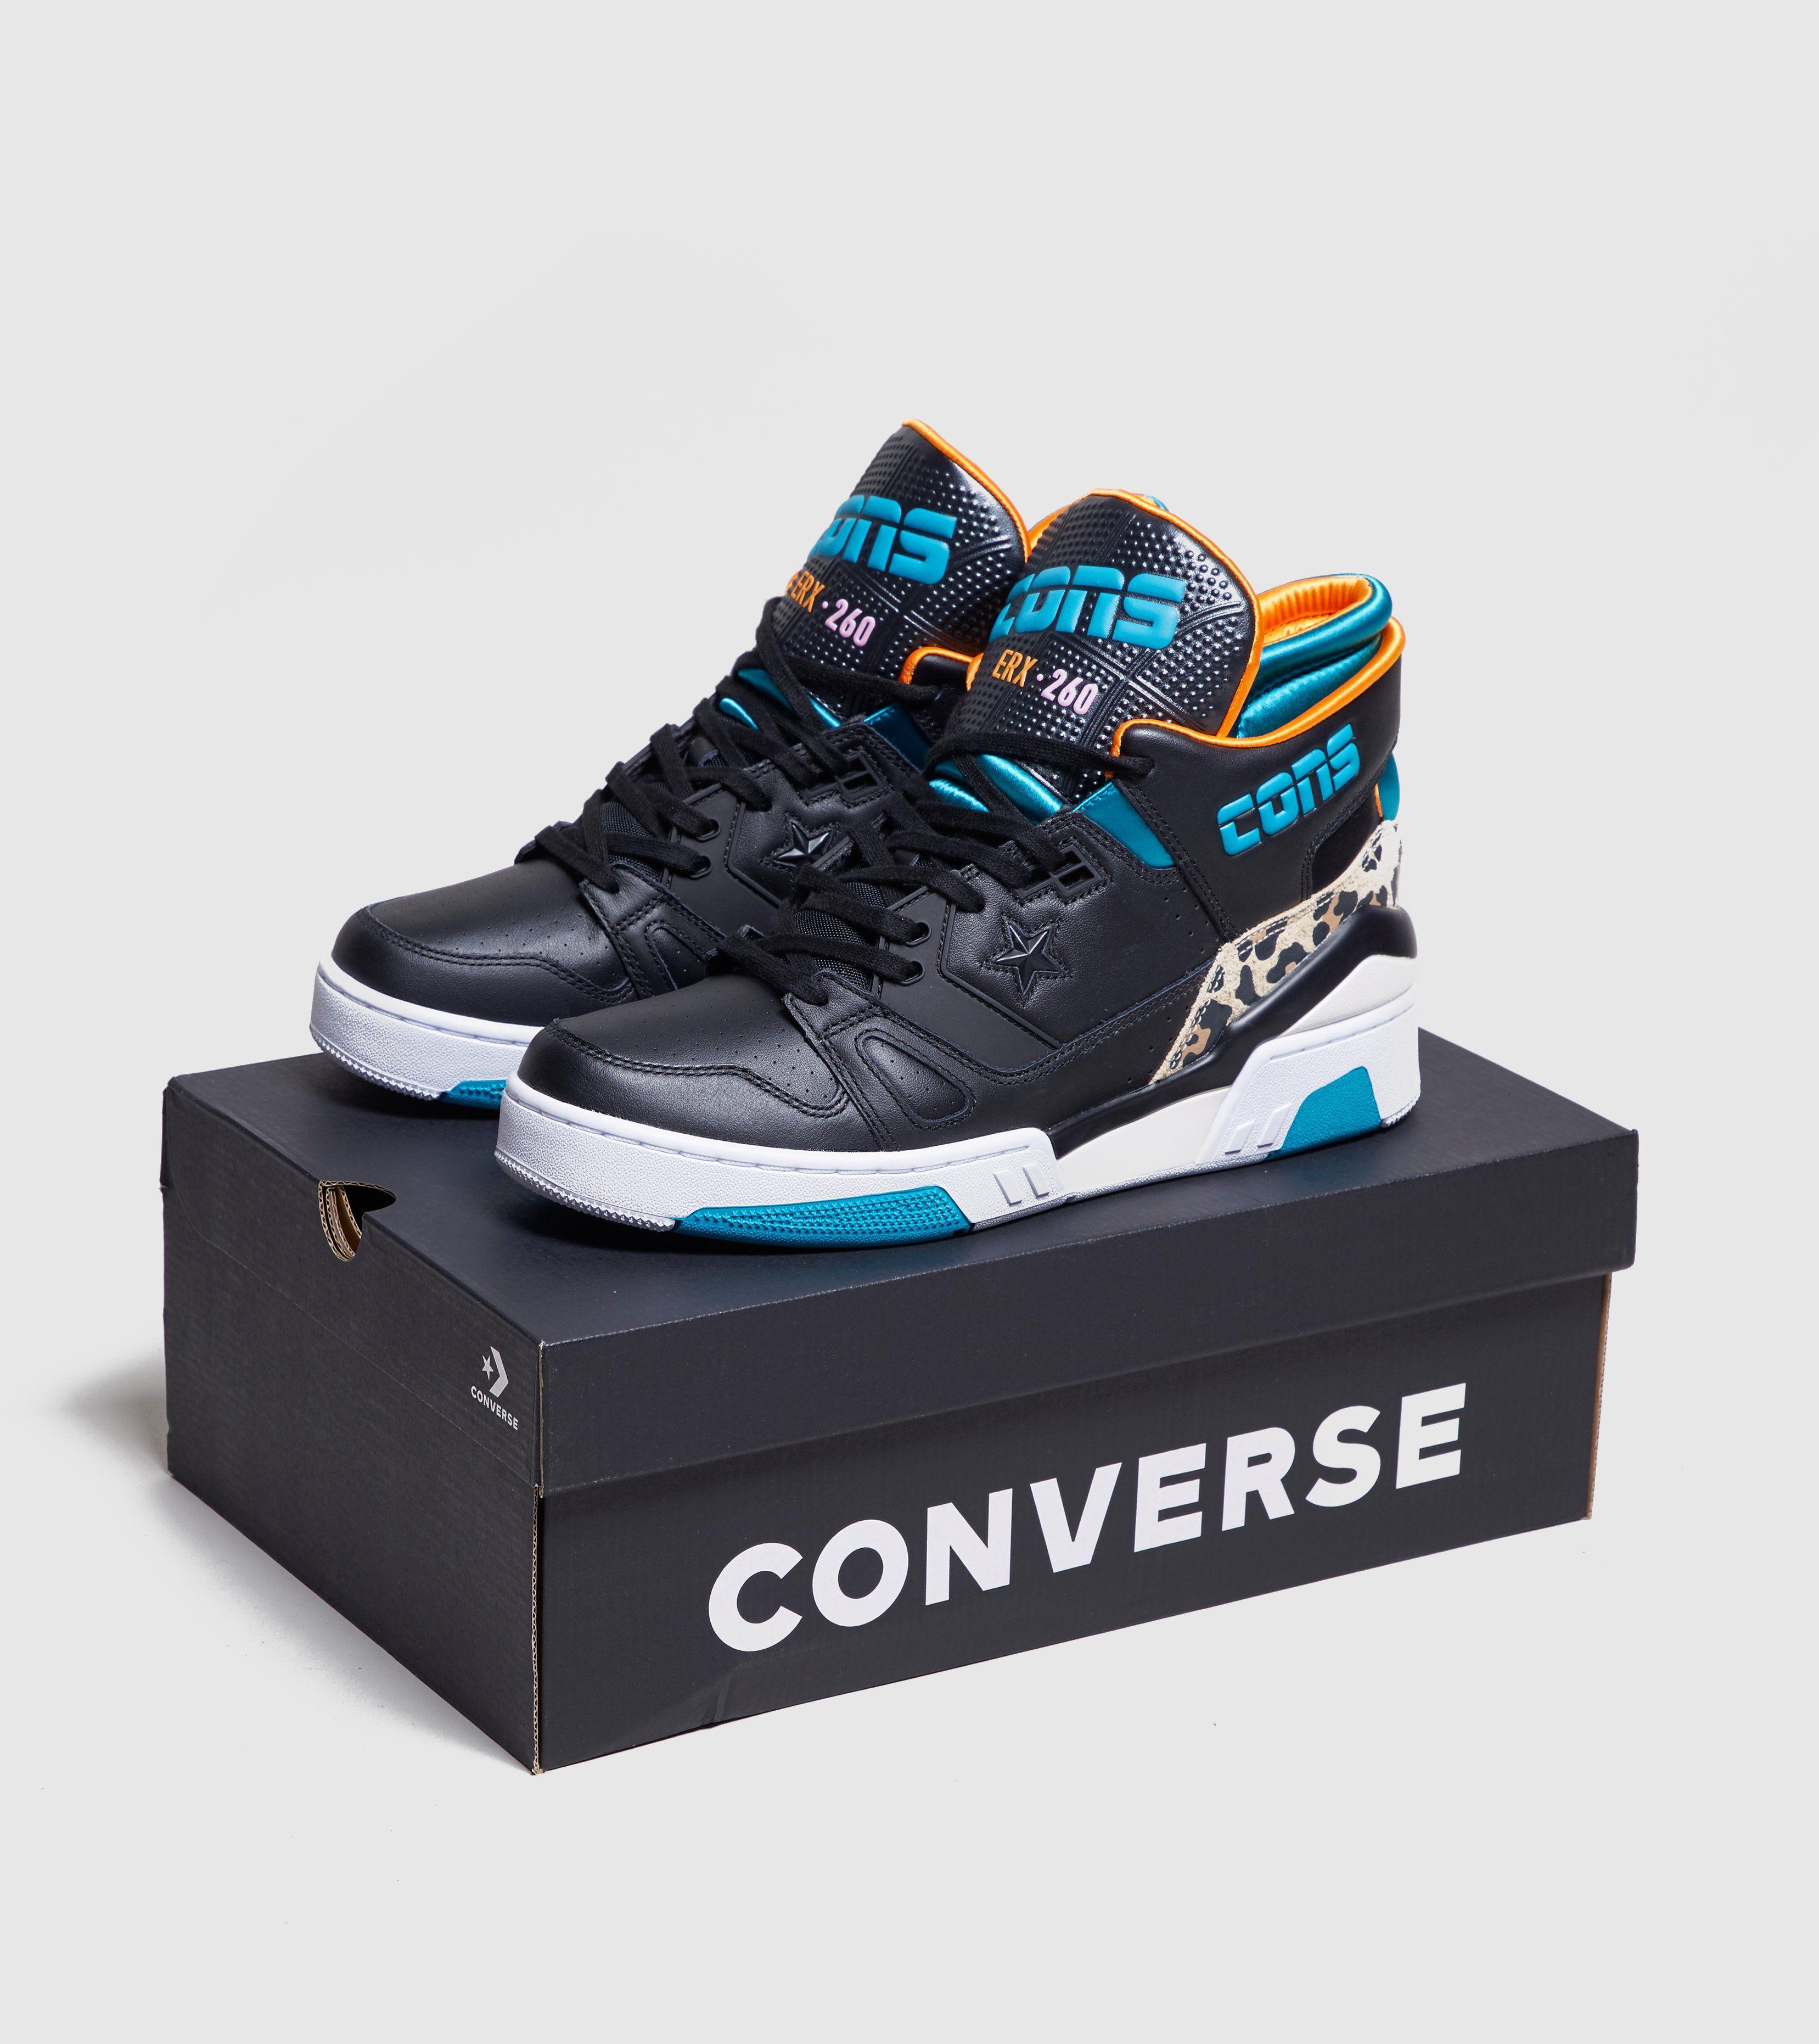 Converse ERX 260